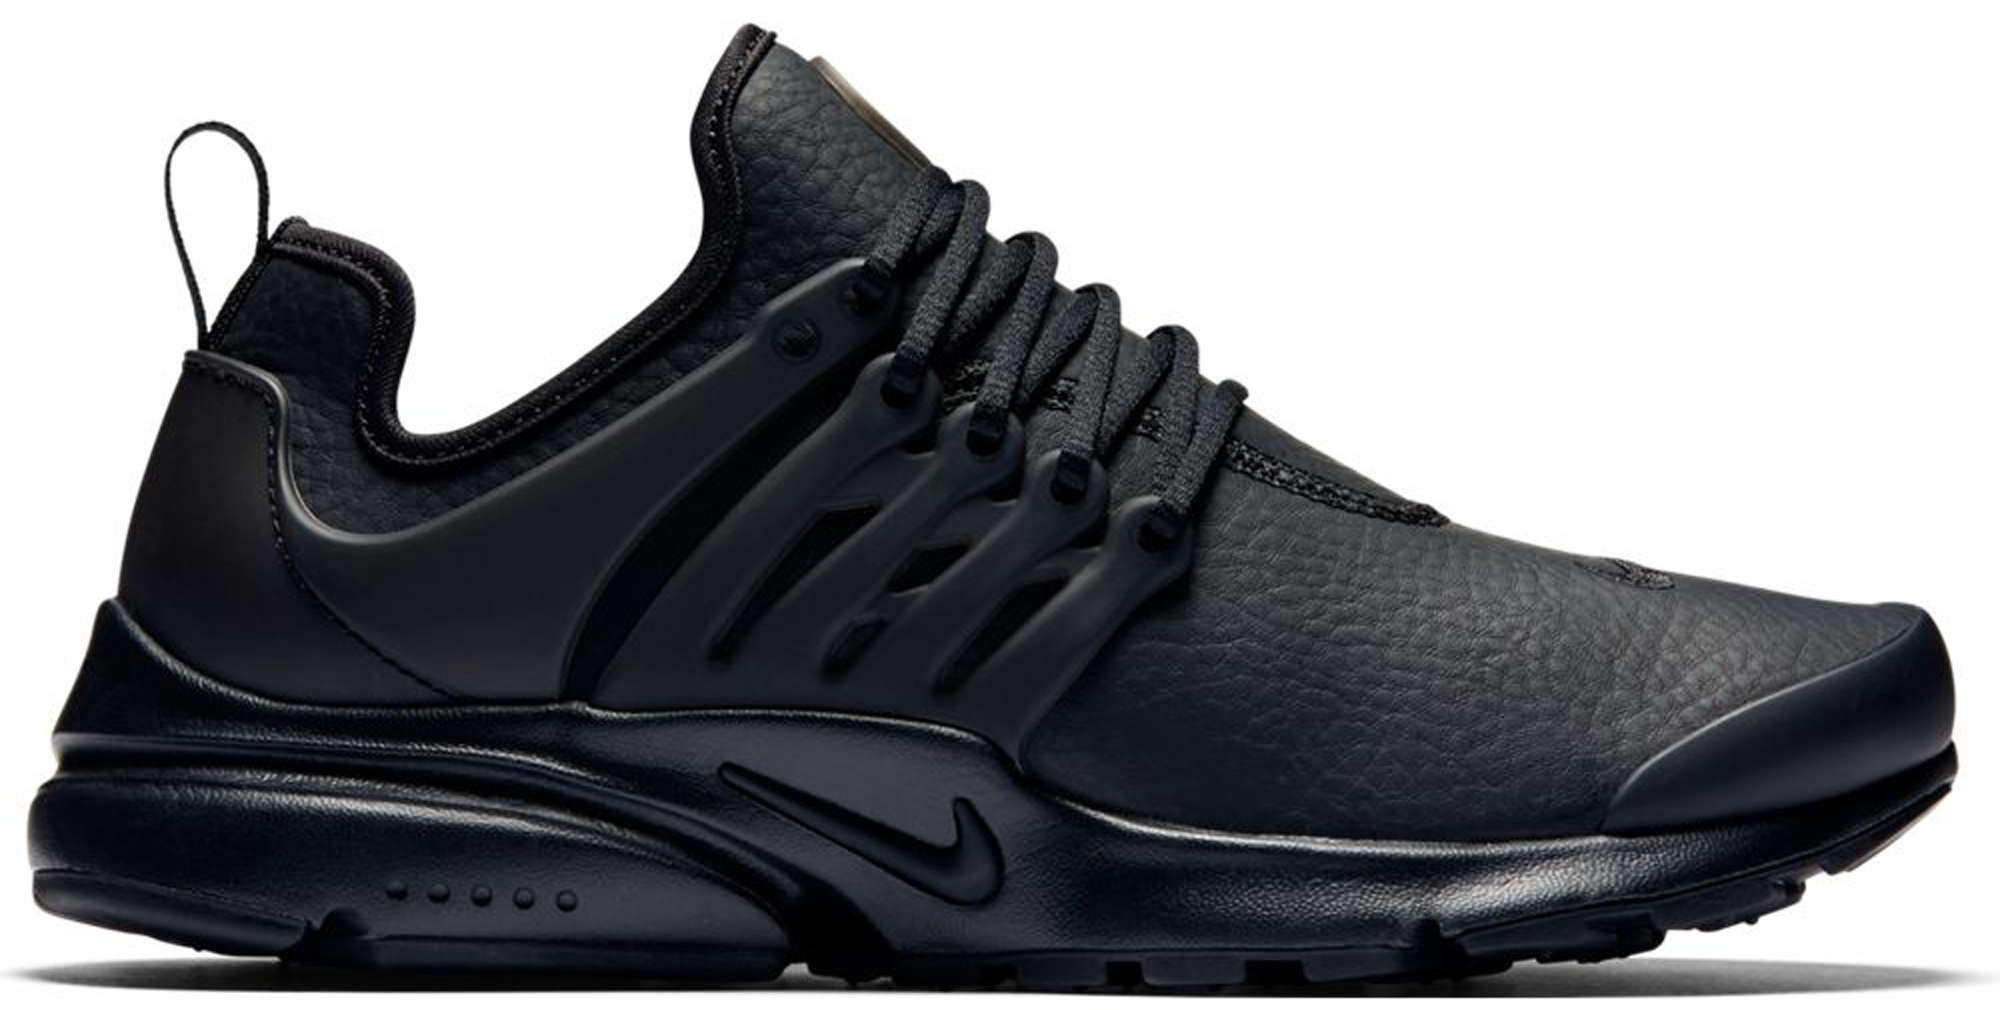 Nike Air Presto Premium Black Leather